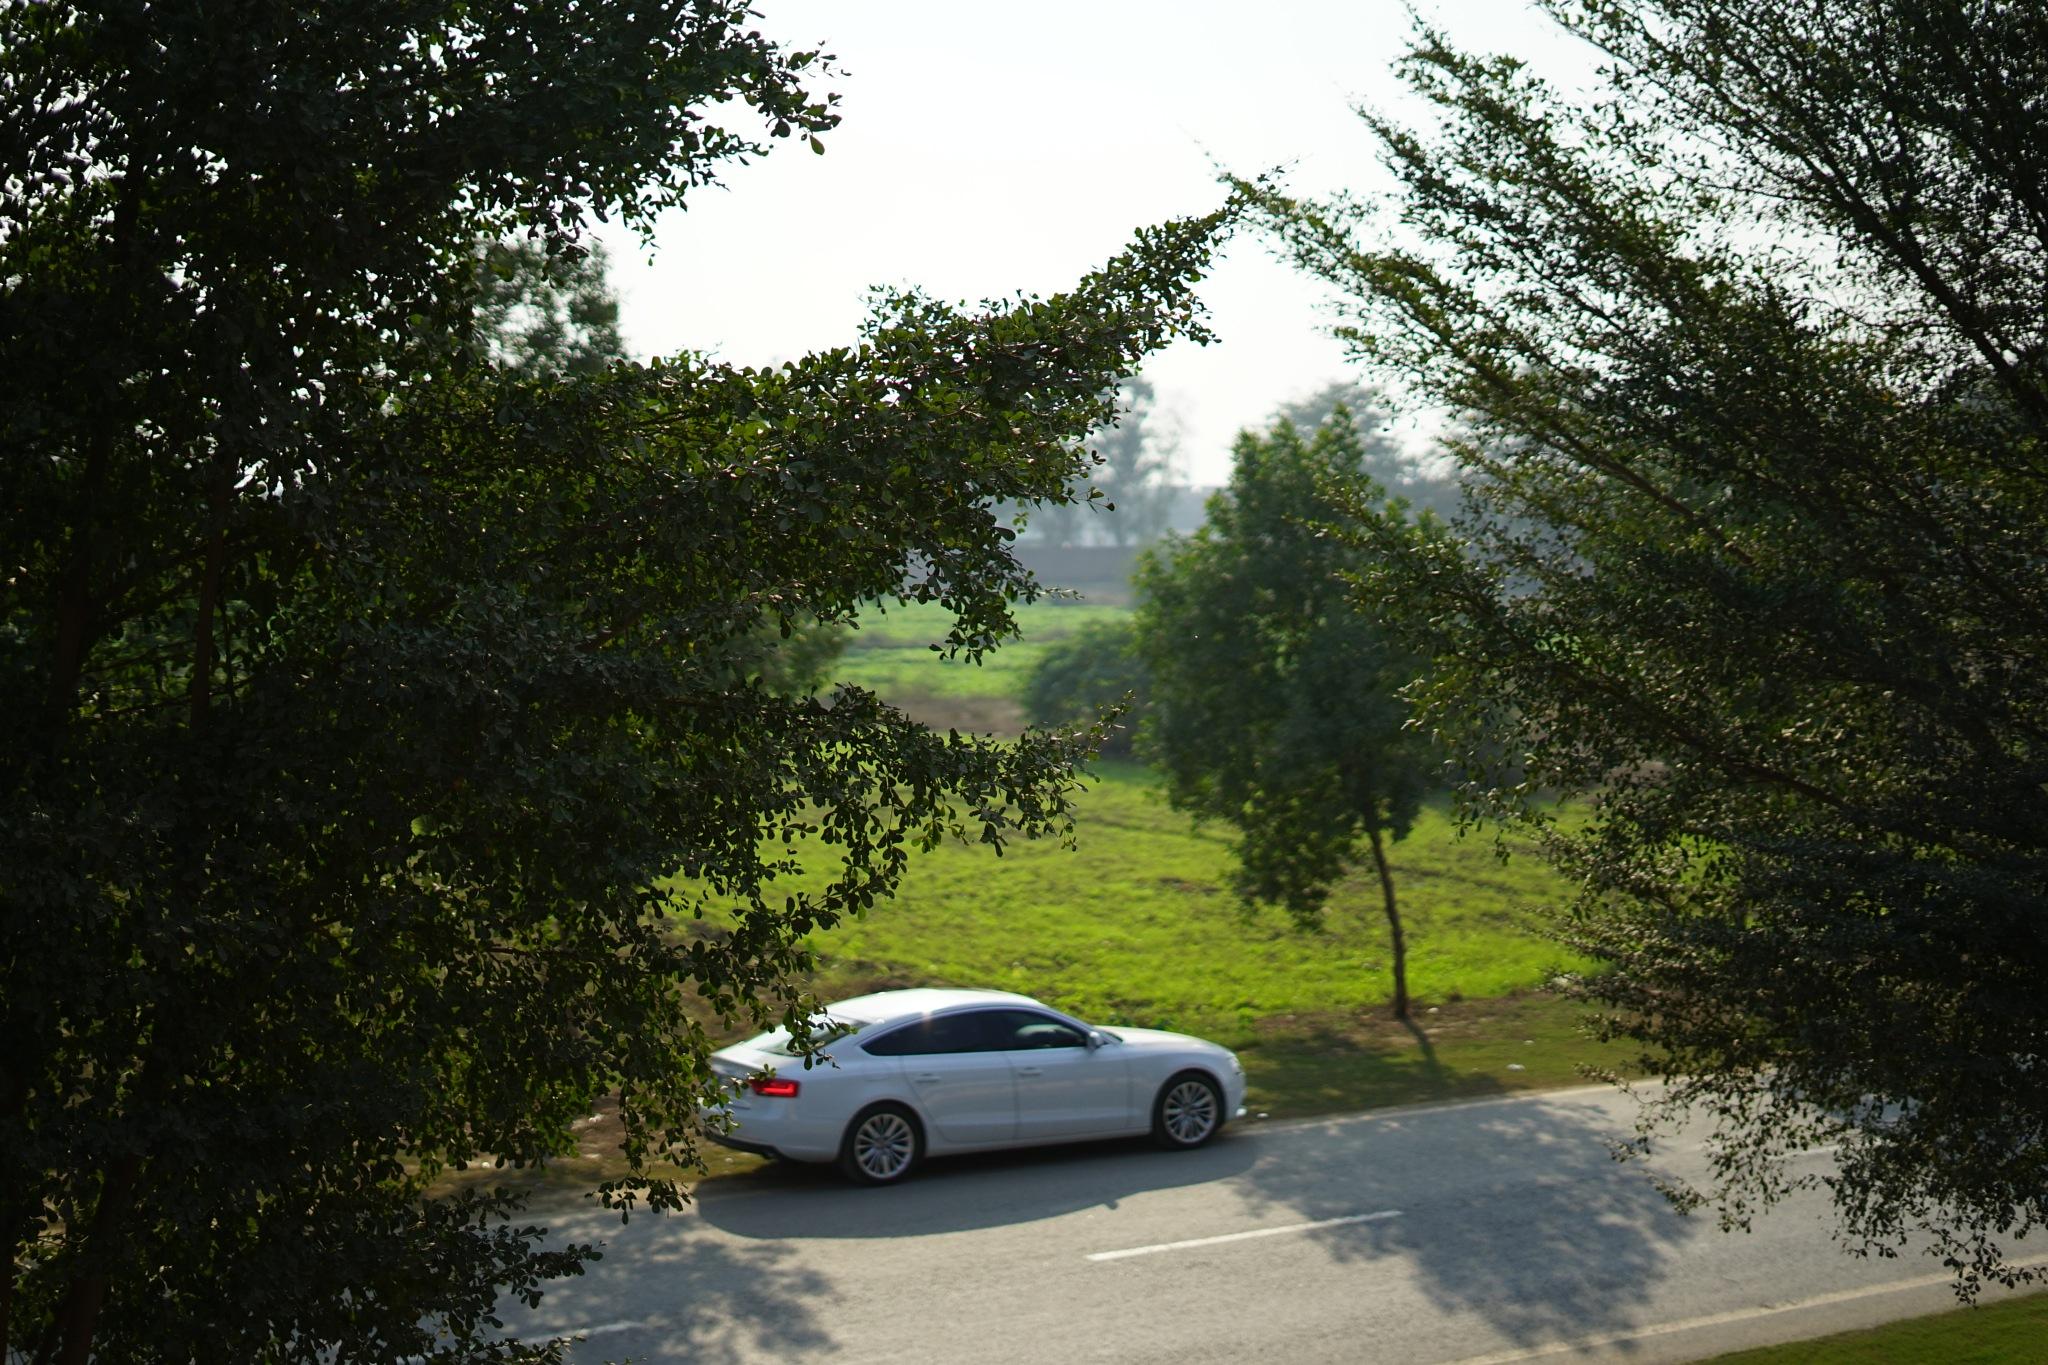 Driving by a farm by Talal Ahmad